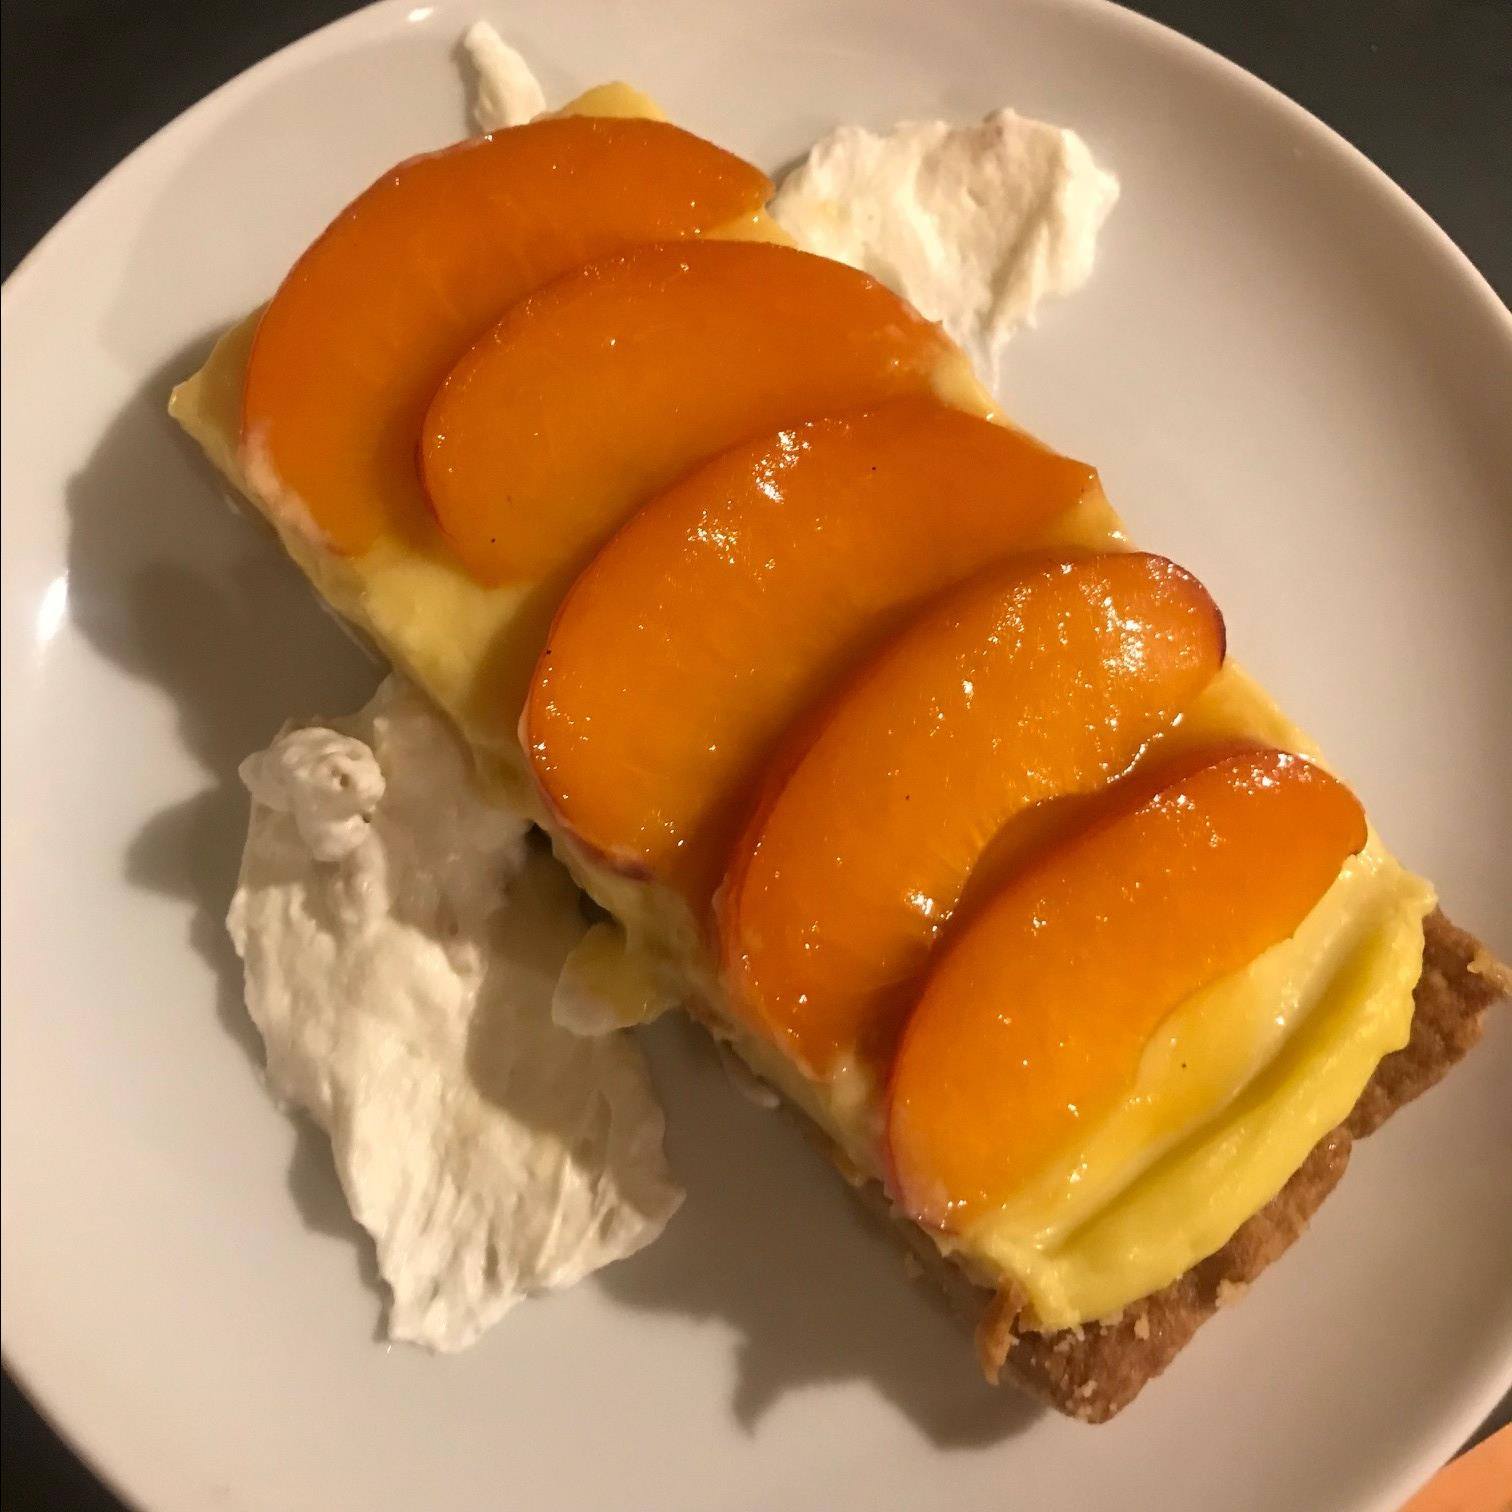 Tieton Apricot Tart with Basil Custard cheesemite